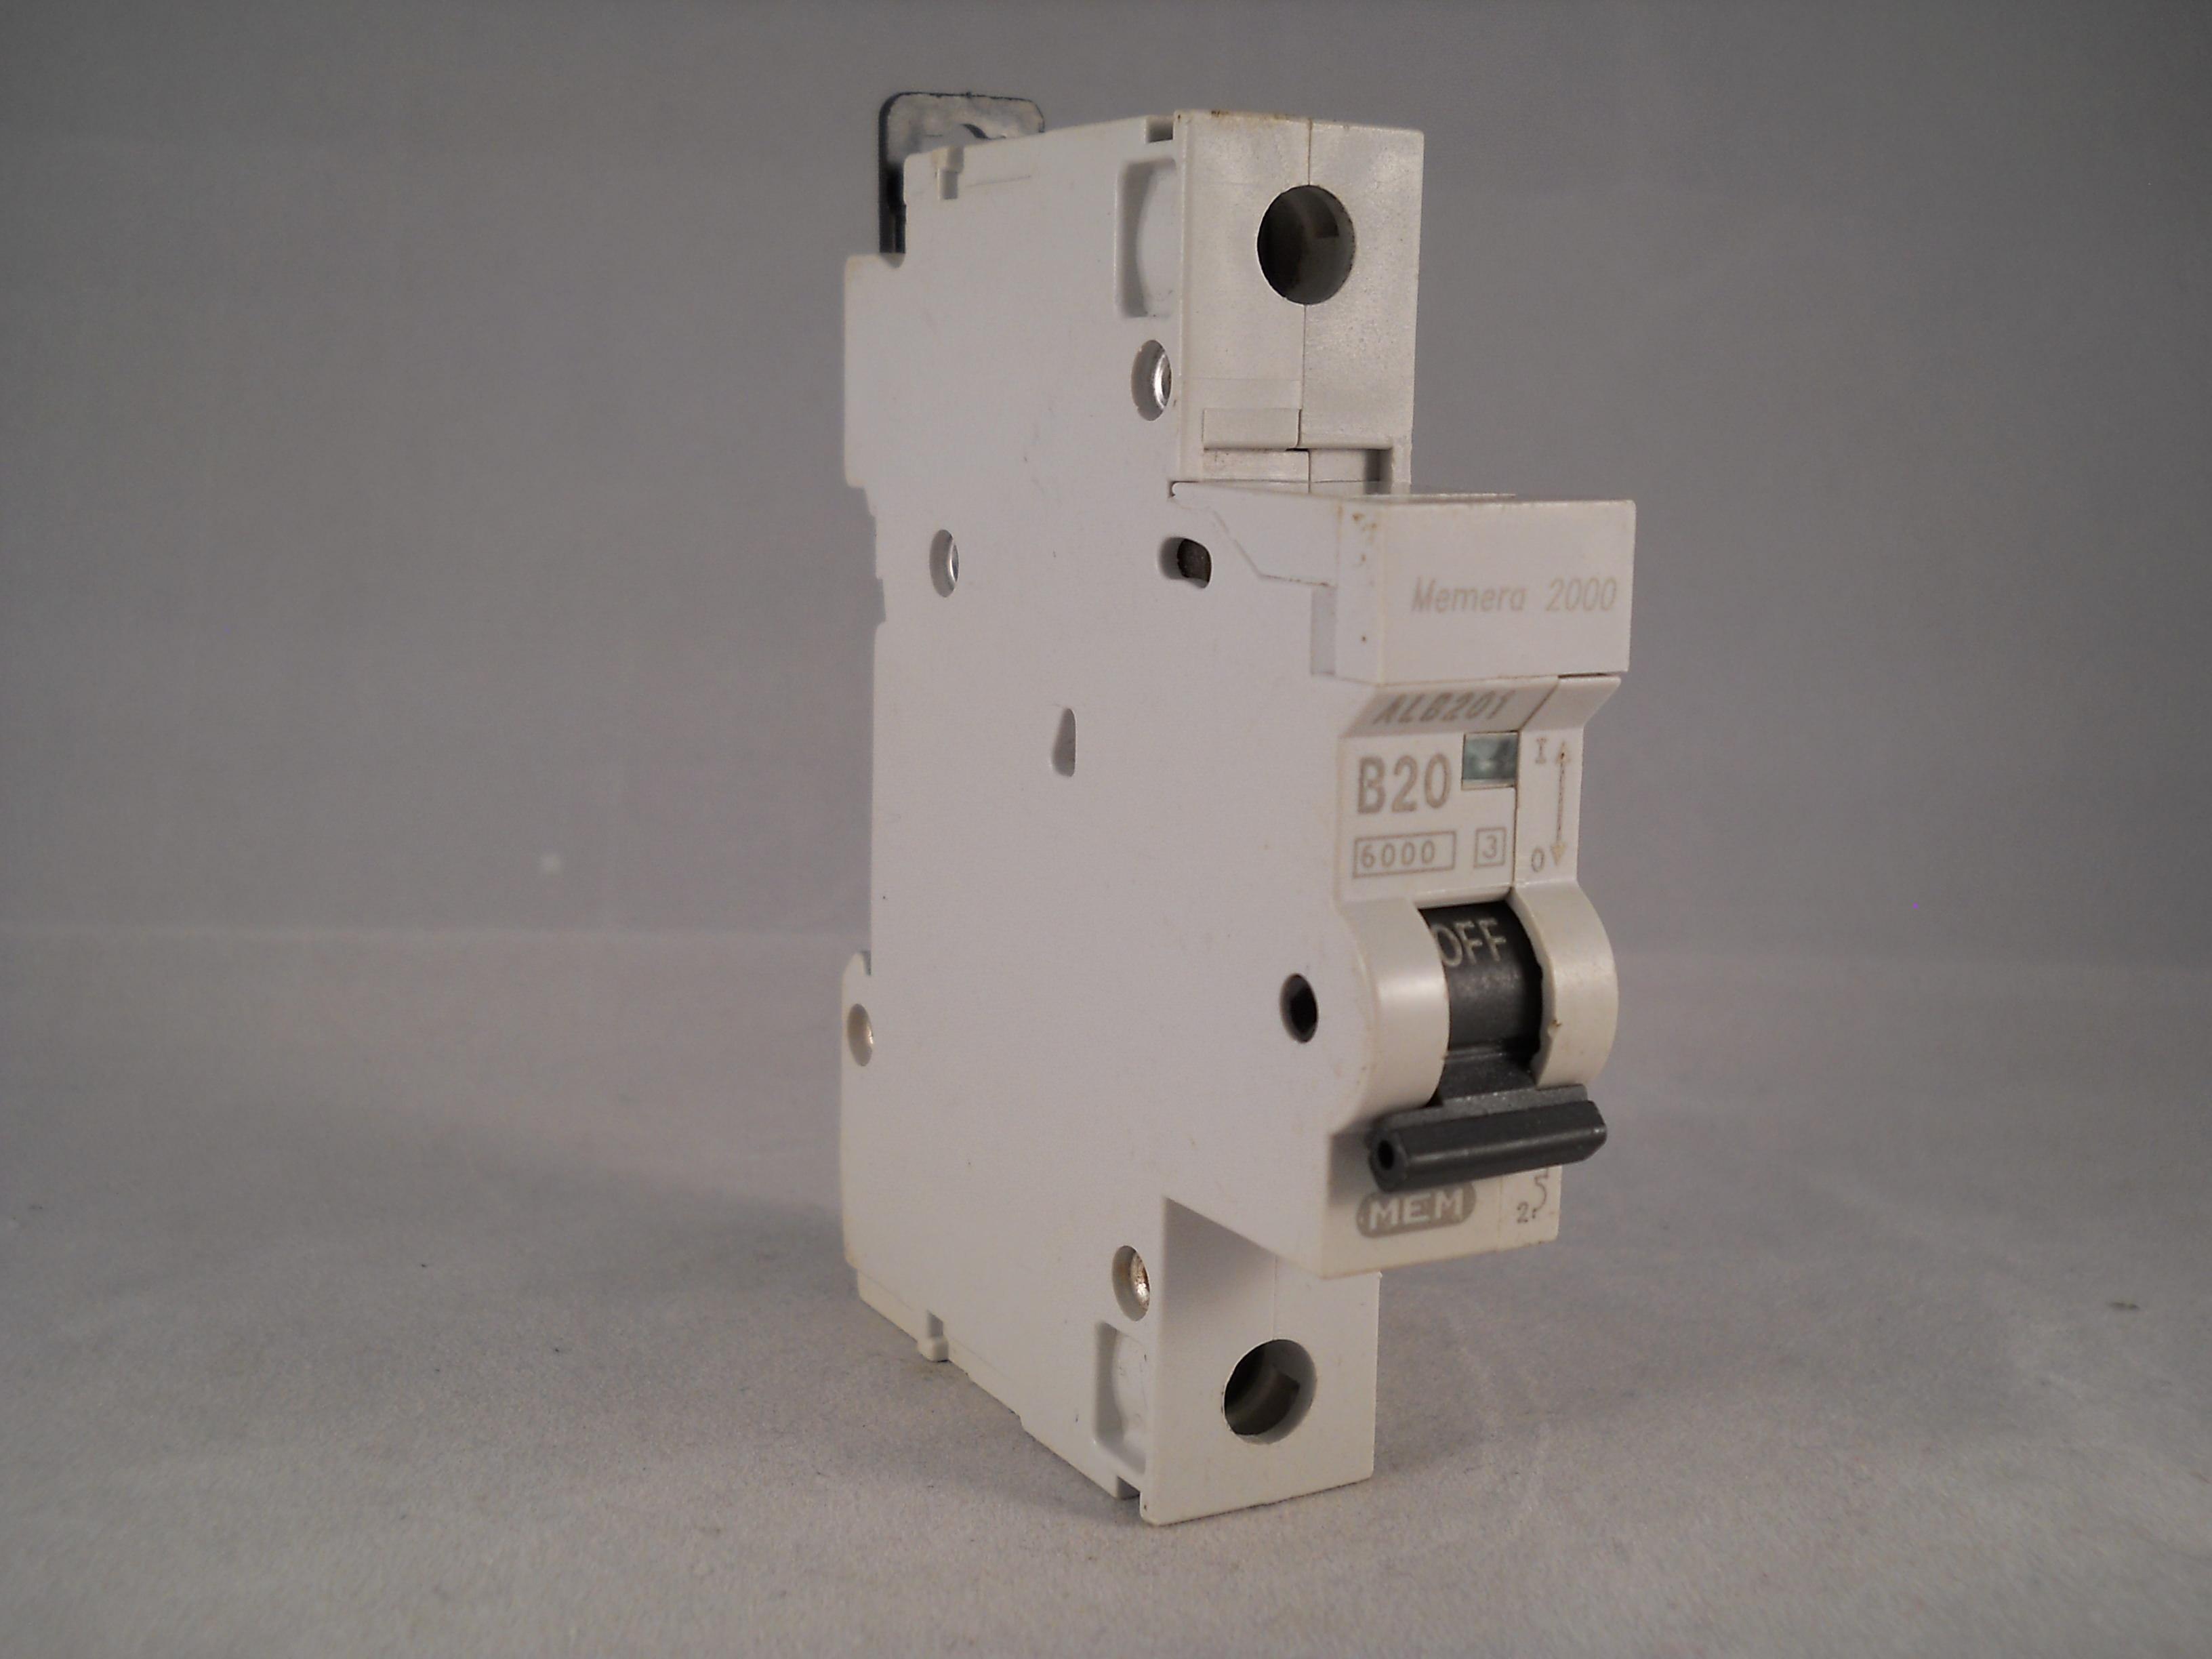 ALB201 1 1 mem memera 2000 mcb 20 amp type b 20a single pole breaker memera 2000 fuse box at gsmx.co